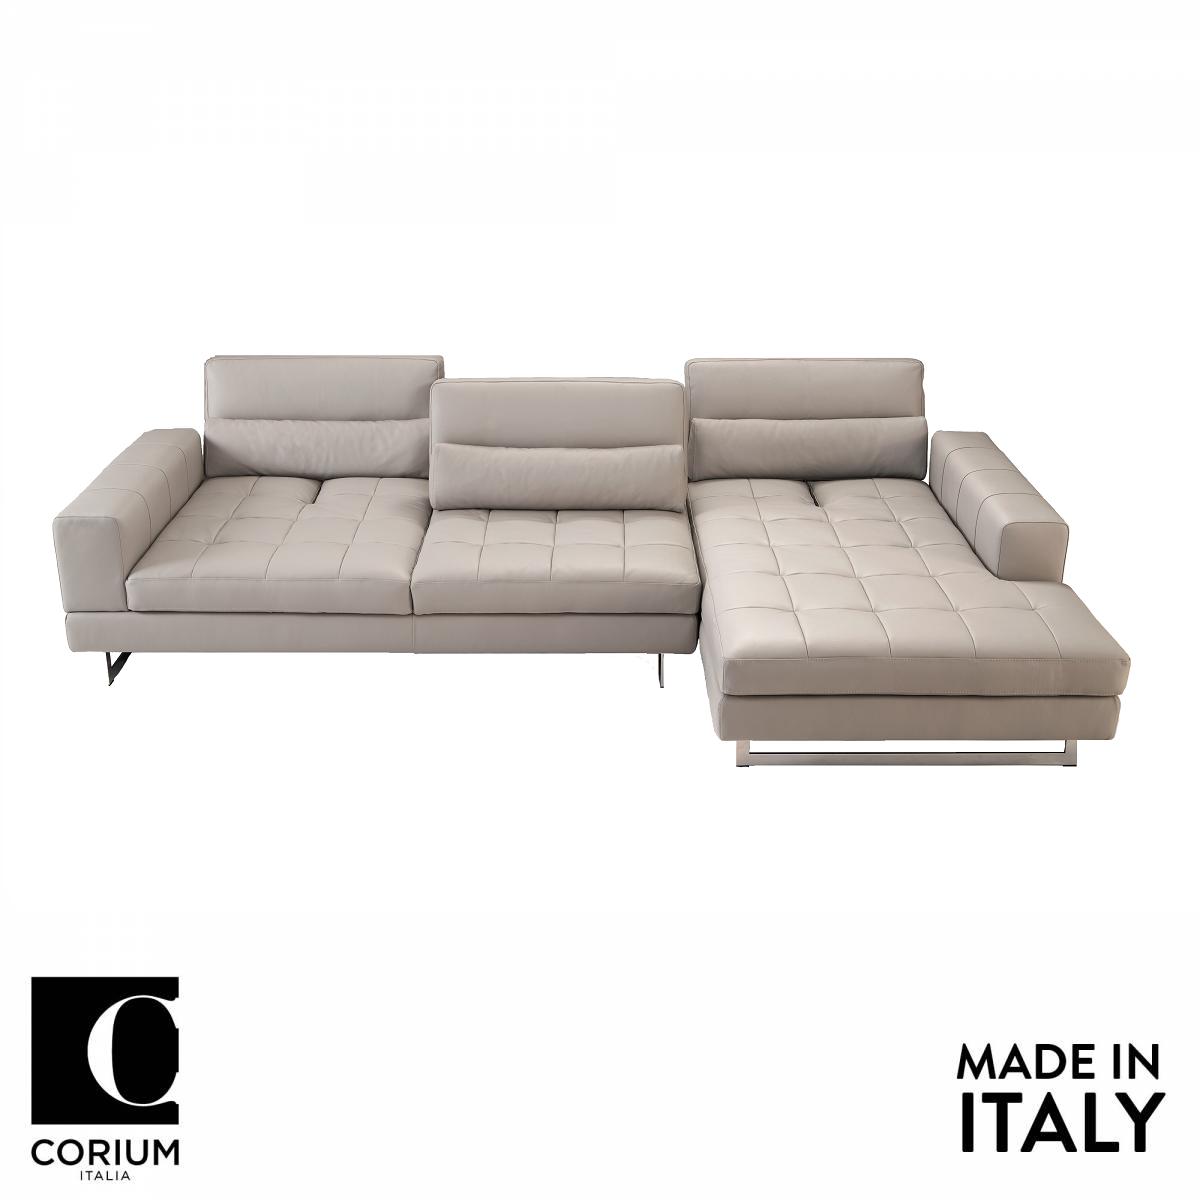 Dandy Leather Sofa